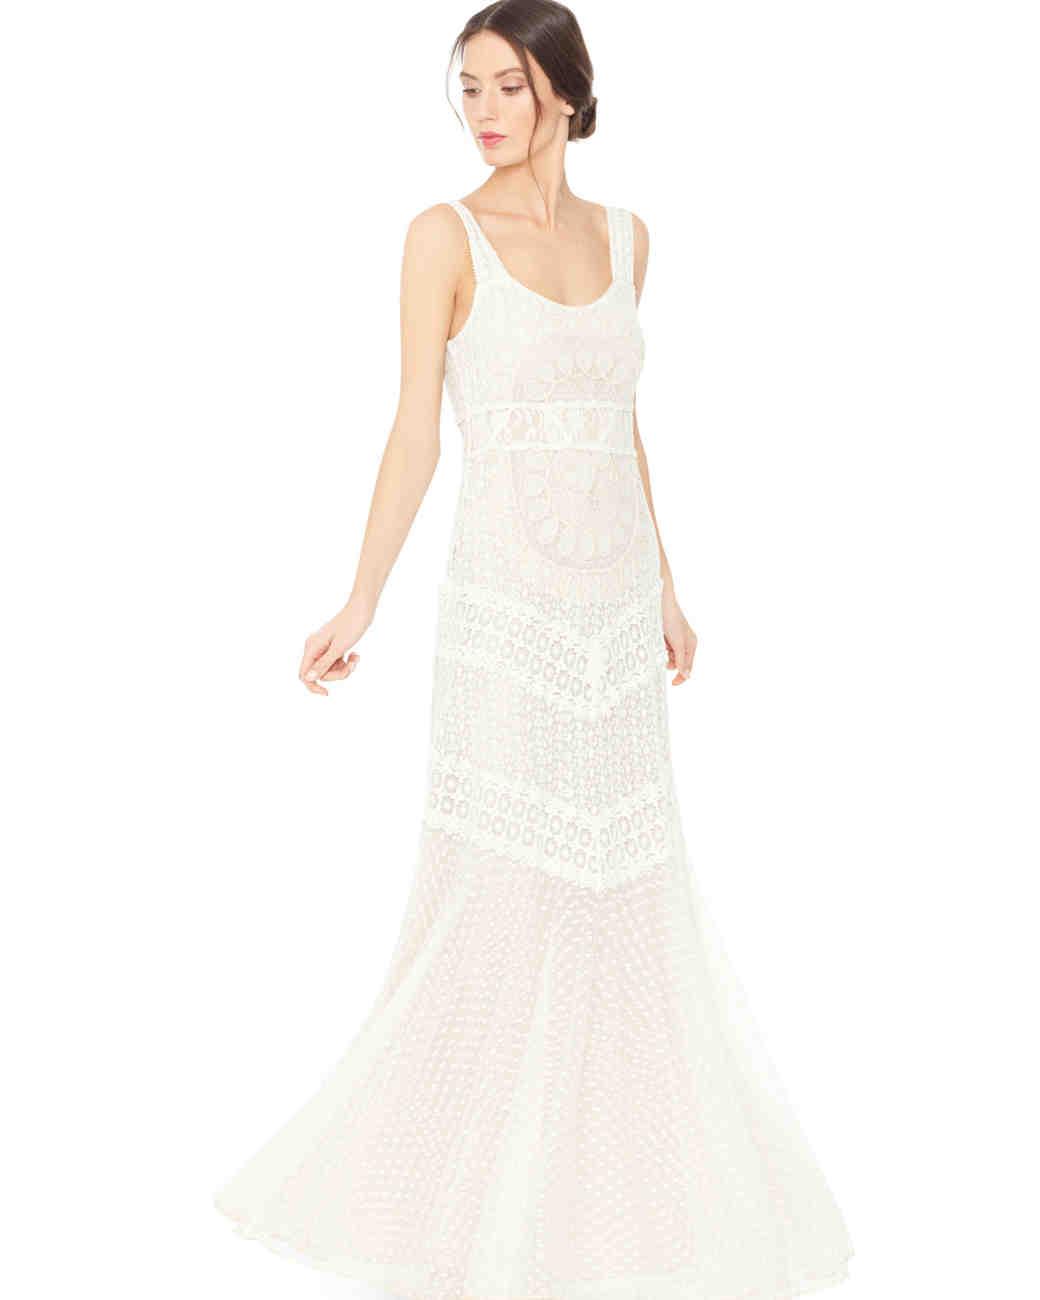 bridal-shower-dress-alice-and-olivia-maxi-dress-0416.jpg